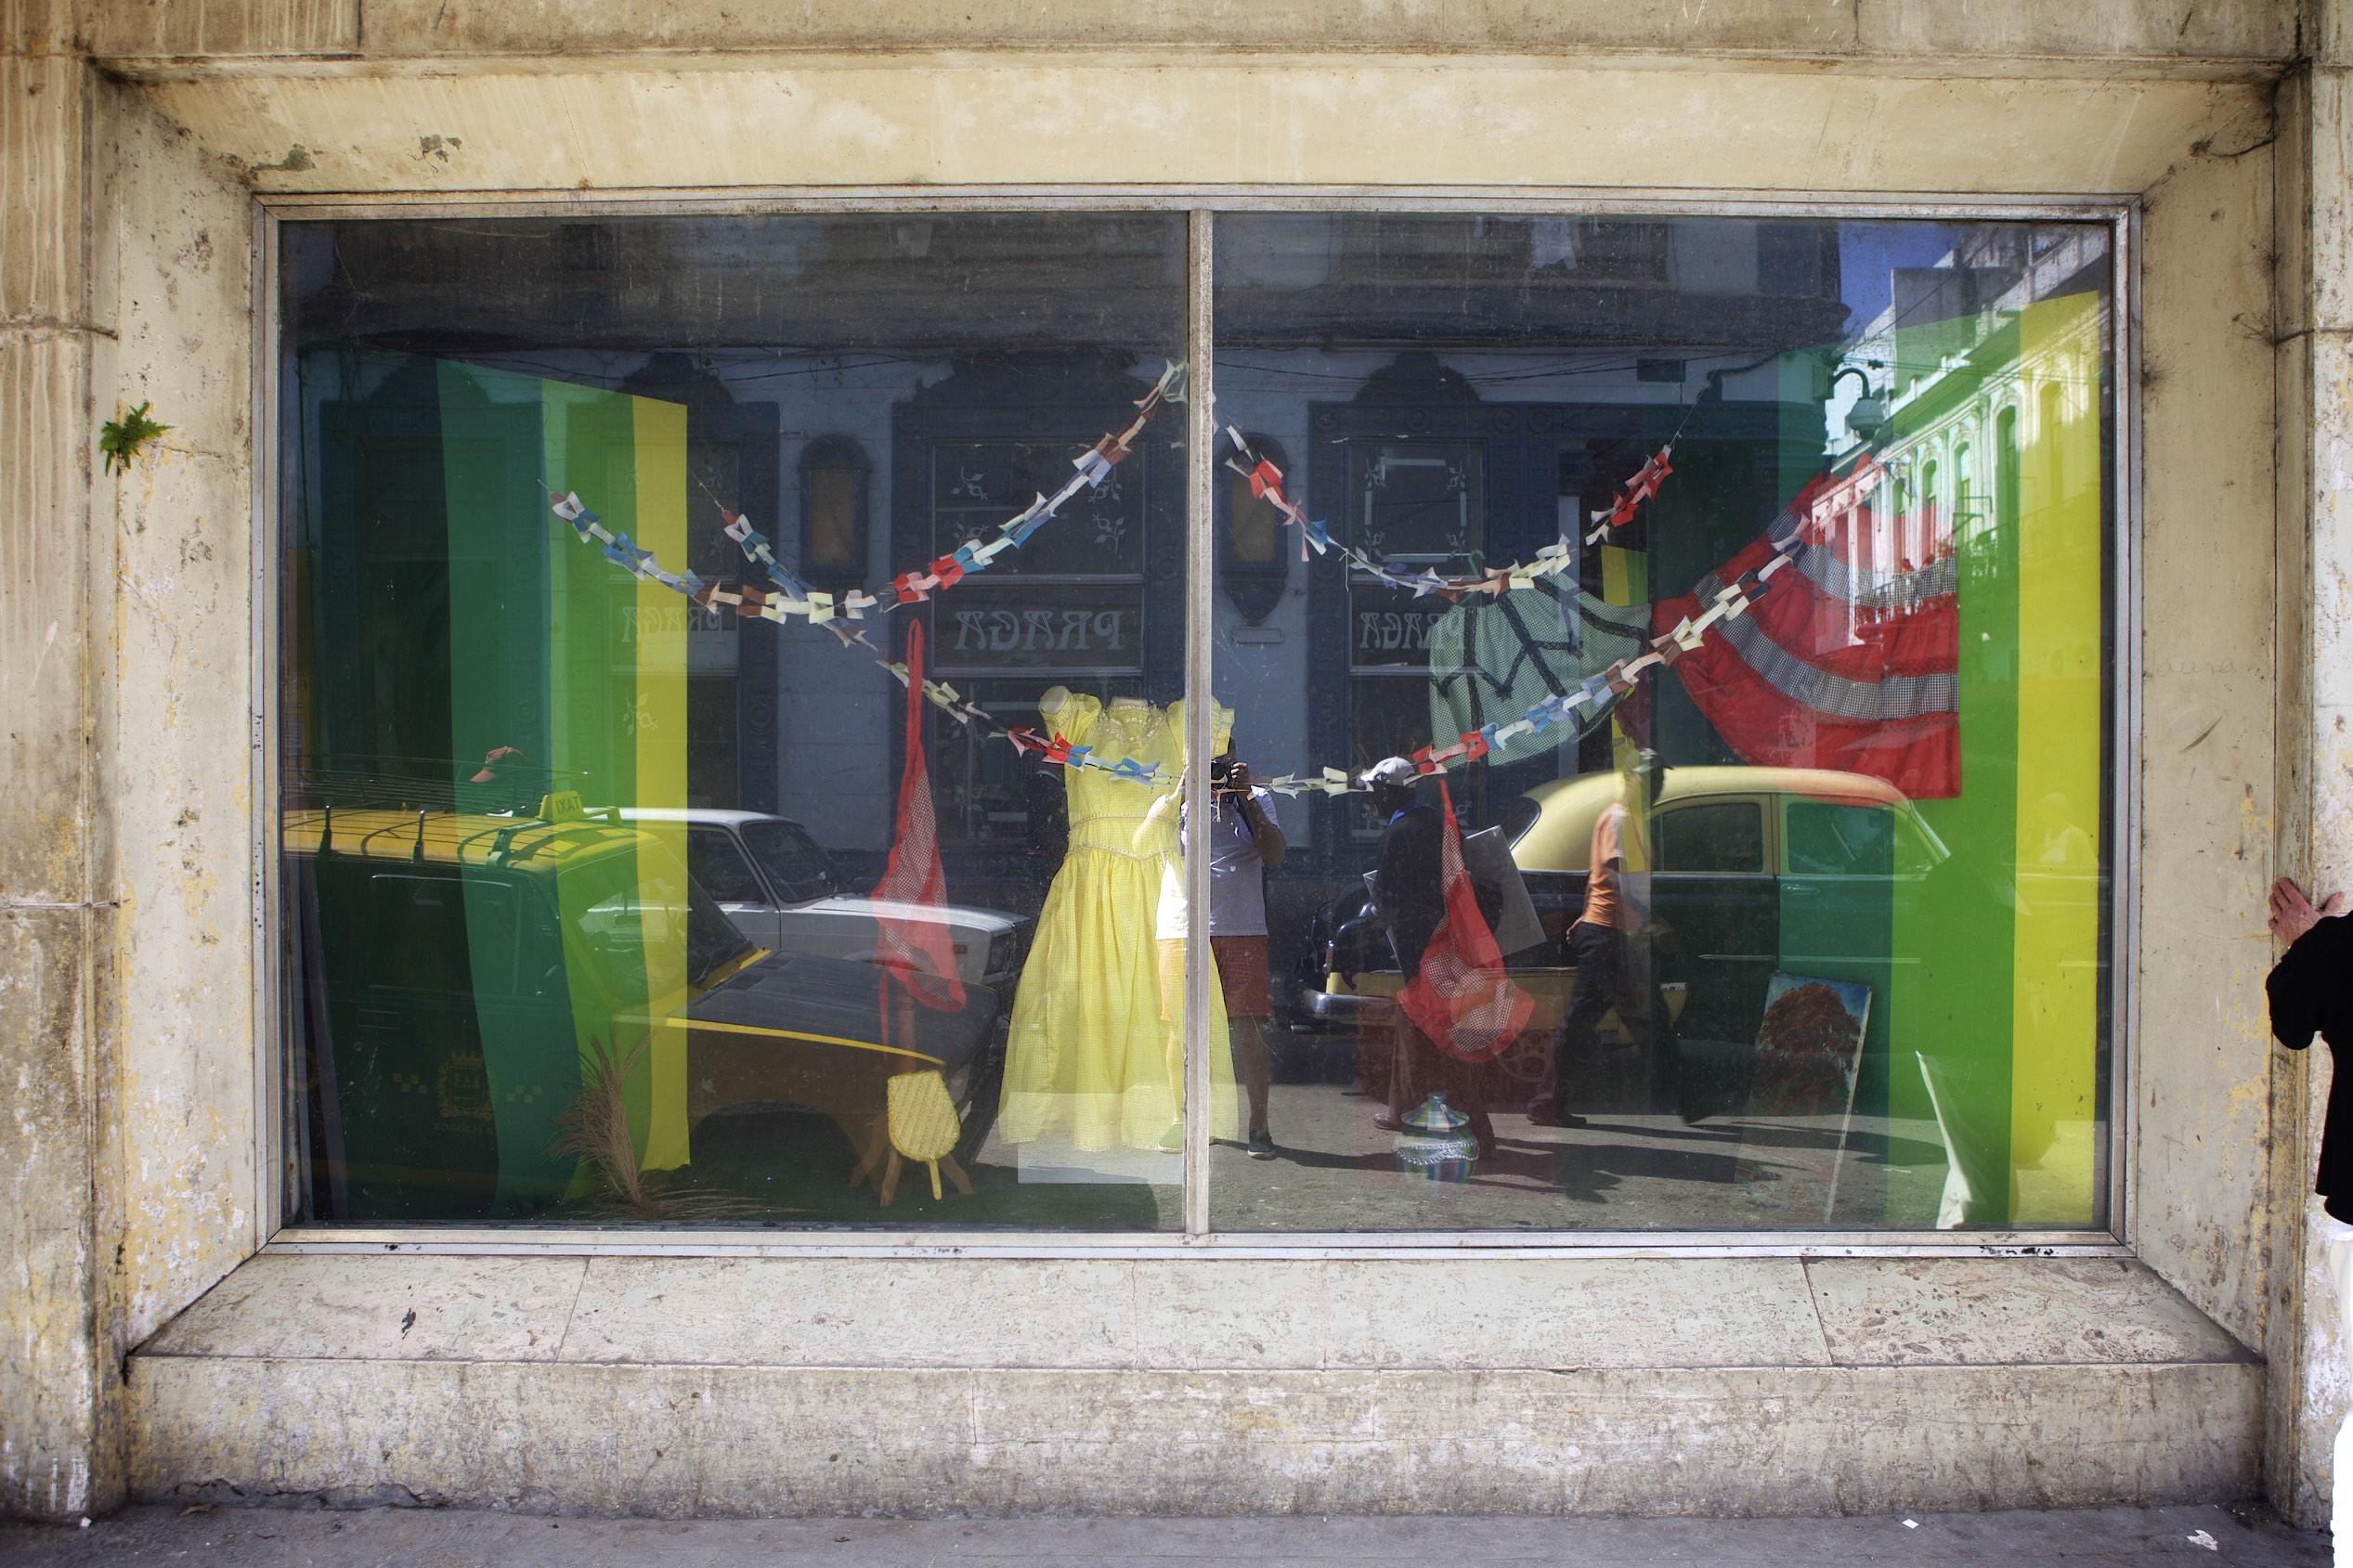 Quiciniera Dress - Dept Store Window